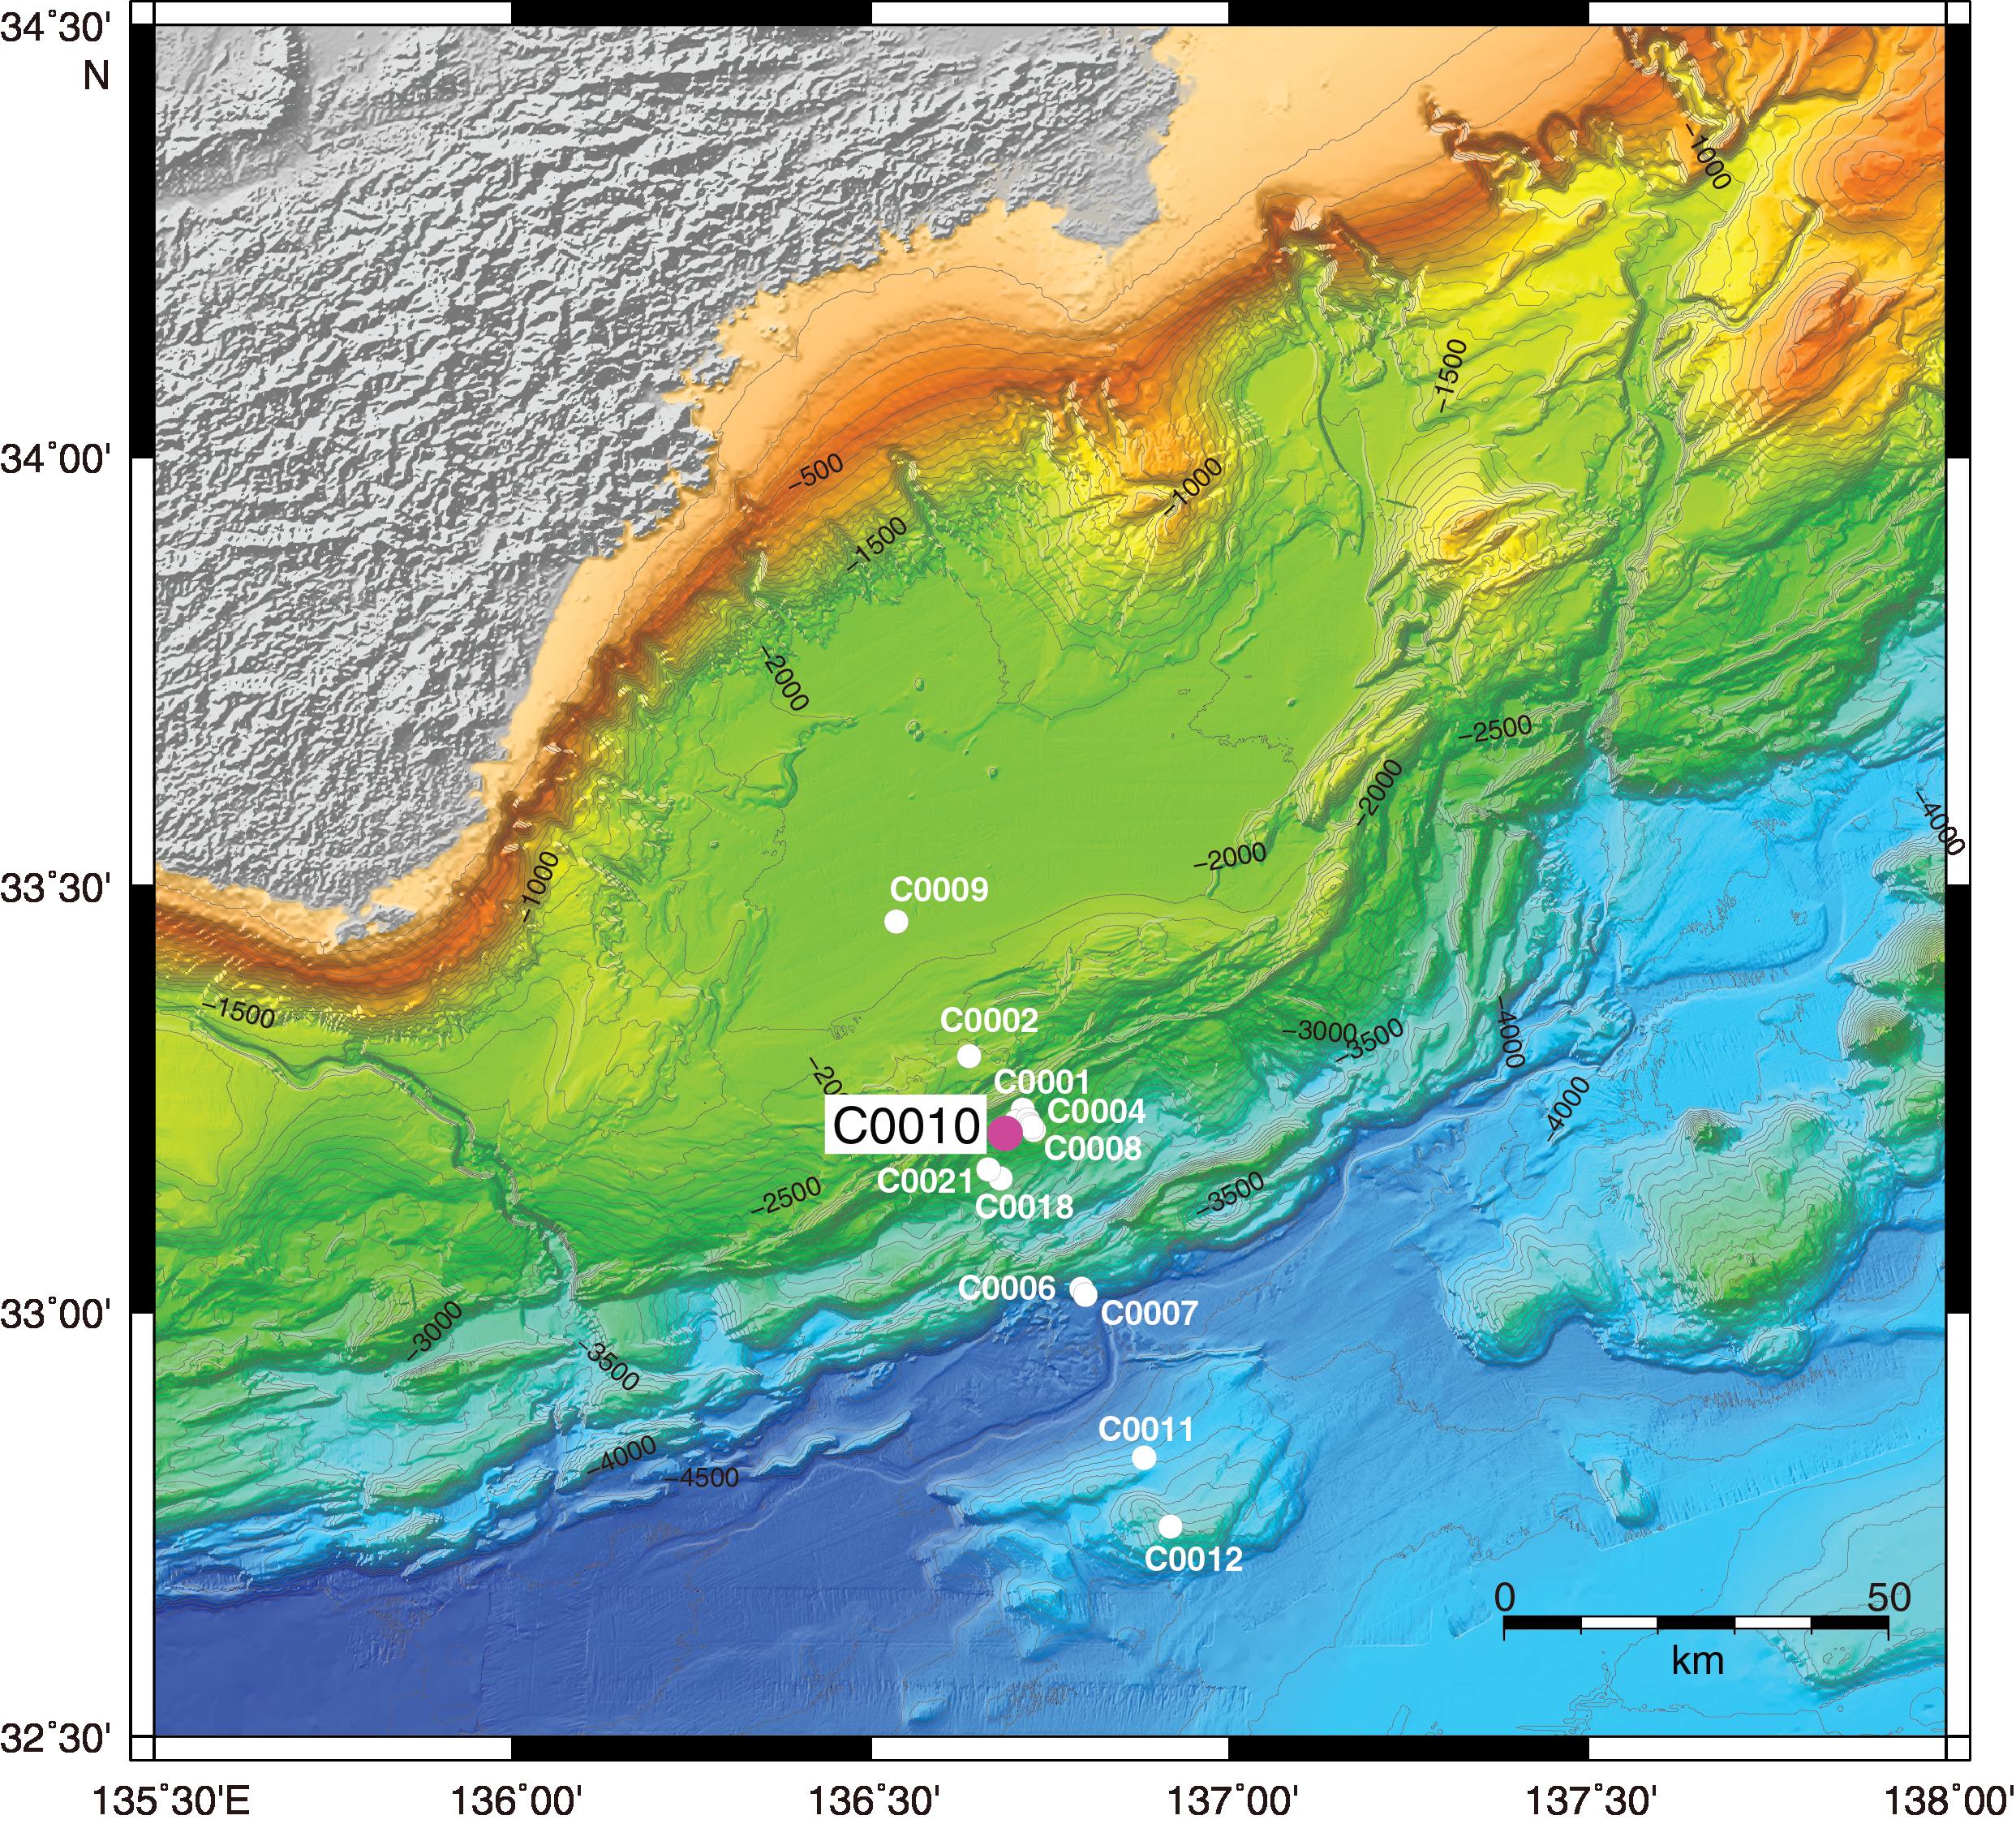 CDEX • Proc  IODP, Expedition 365, NanTroSEIZE Stage 3